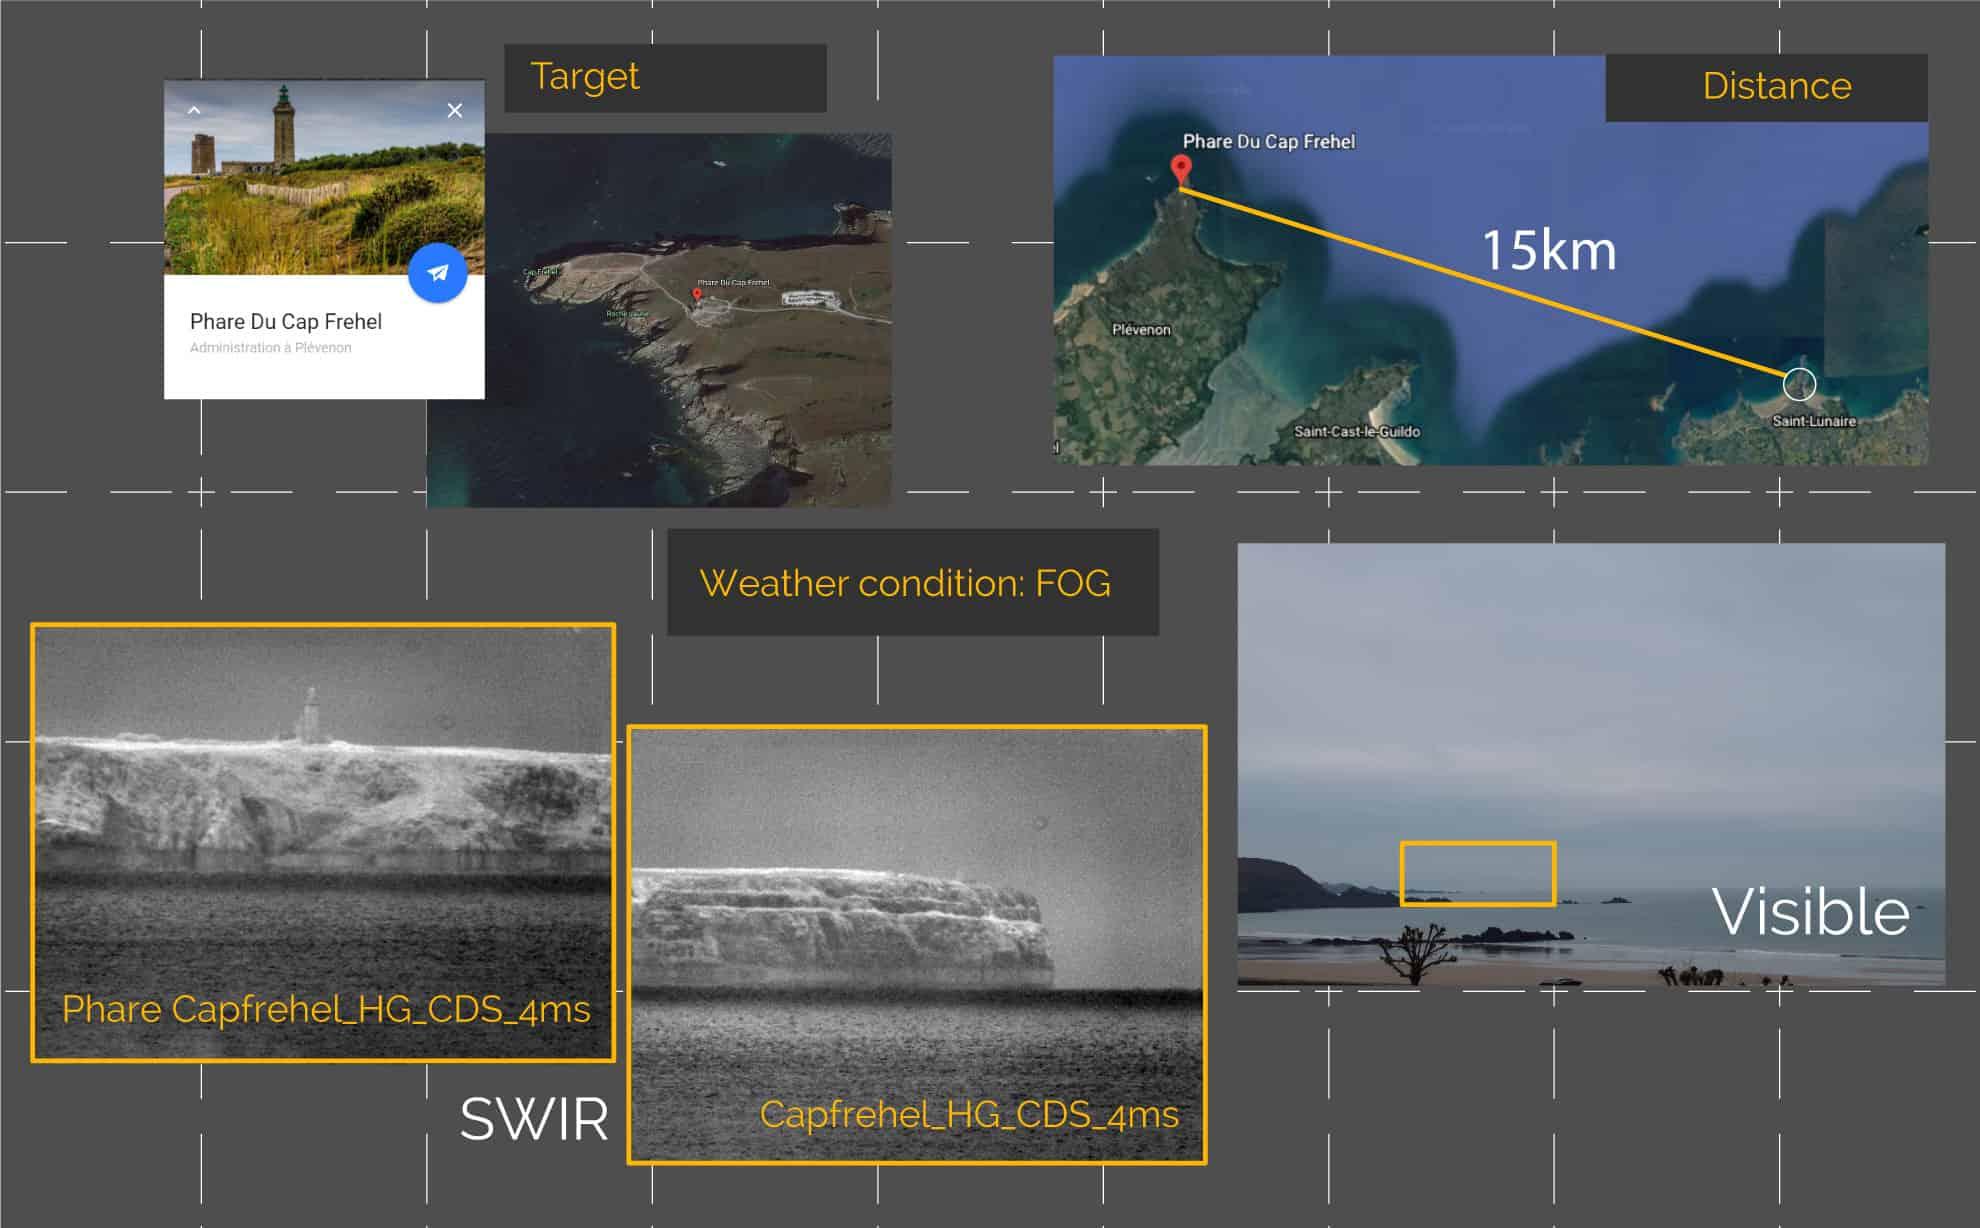 Cap frehel observation with NIT SWIR camera